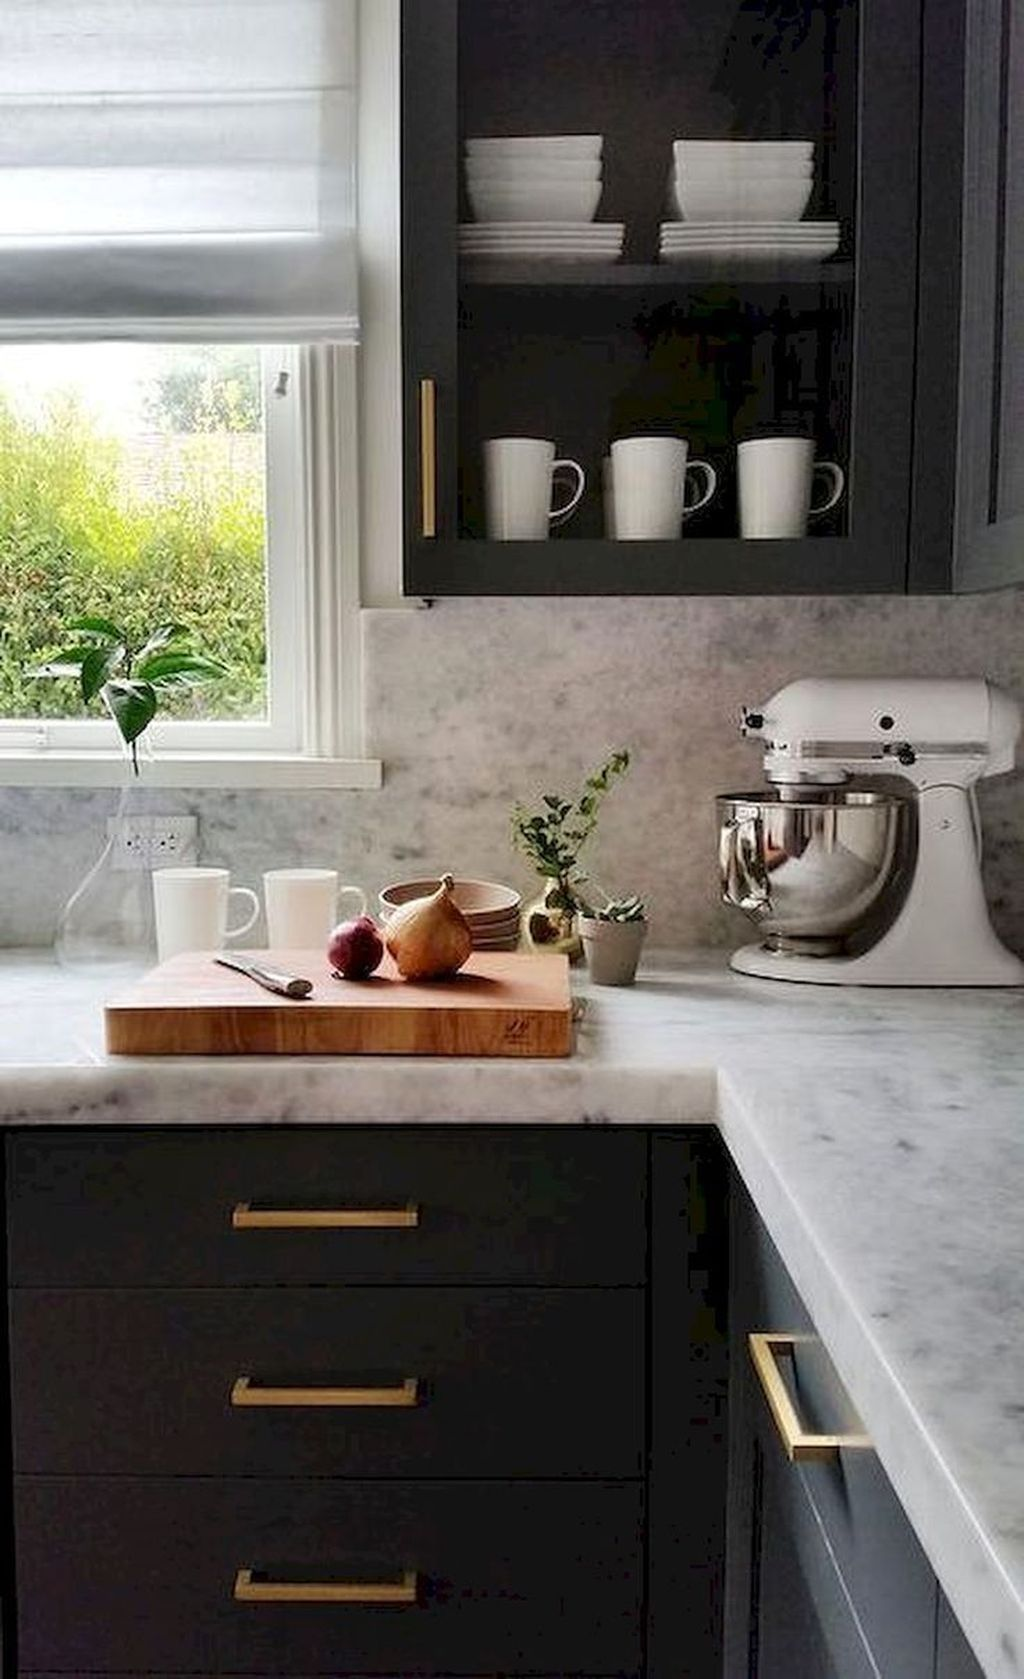 Idee Per La Cucina pin di aurora fiorini su casa? | ristrutturazione cucina